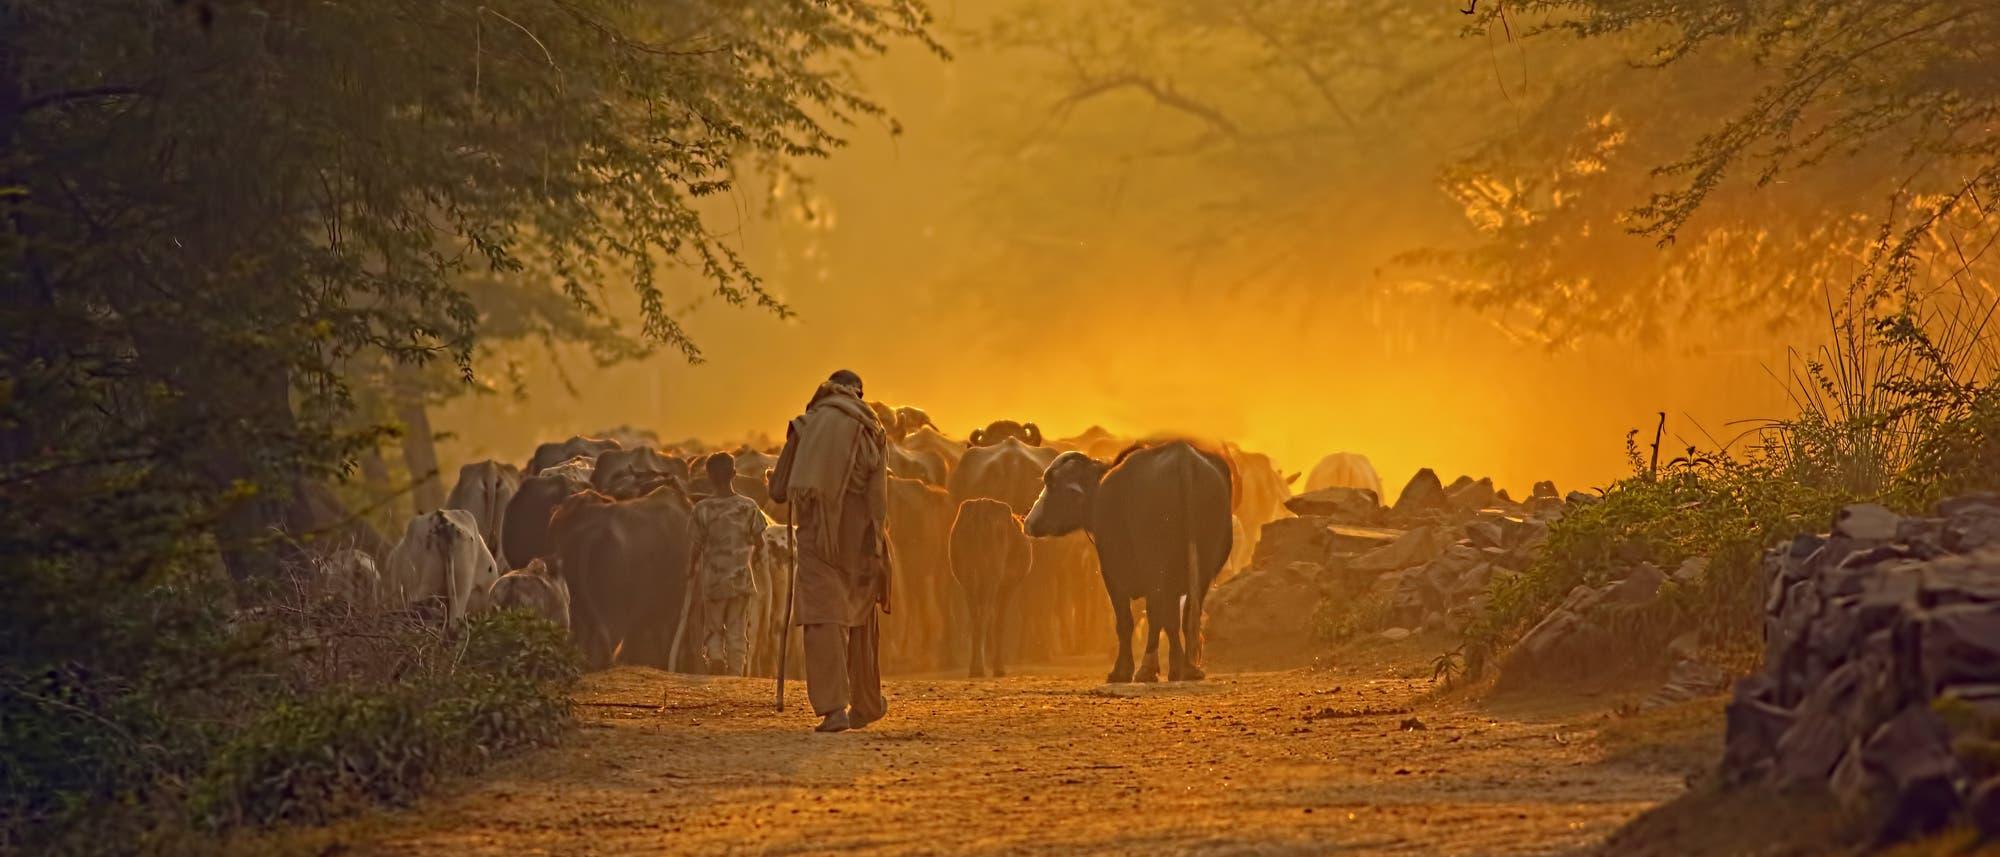 Hirte mit Rinderherde